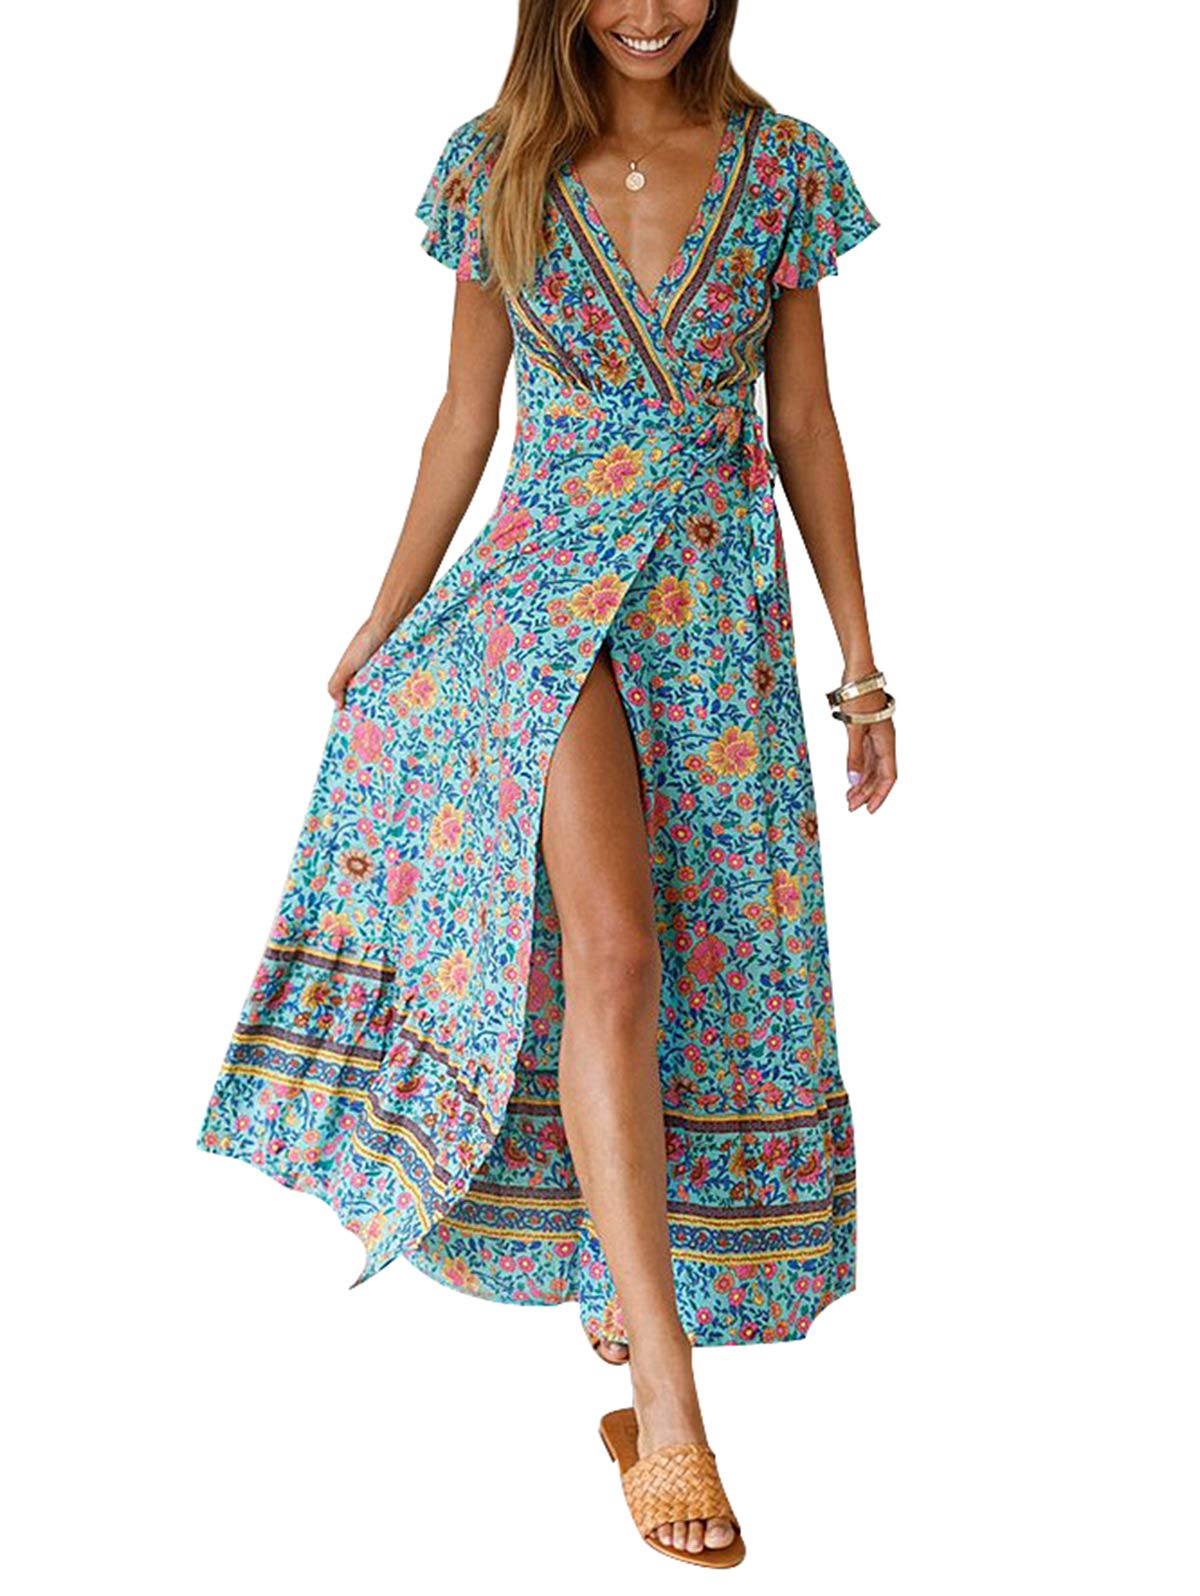 Available at Amazon: Temofon Women's Dresses Bohemian Floral Printed Summer Casual Short Sleeve Wrap V-Neck High Split Ethnic Maxi Dress